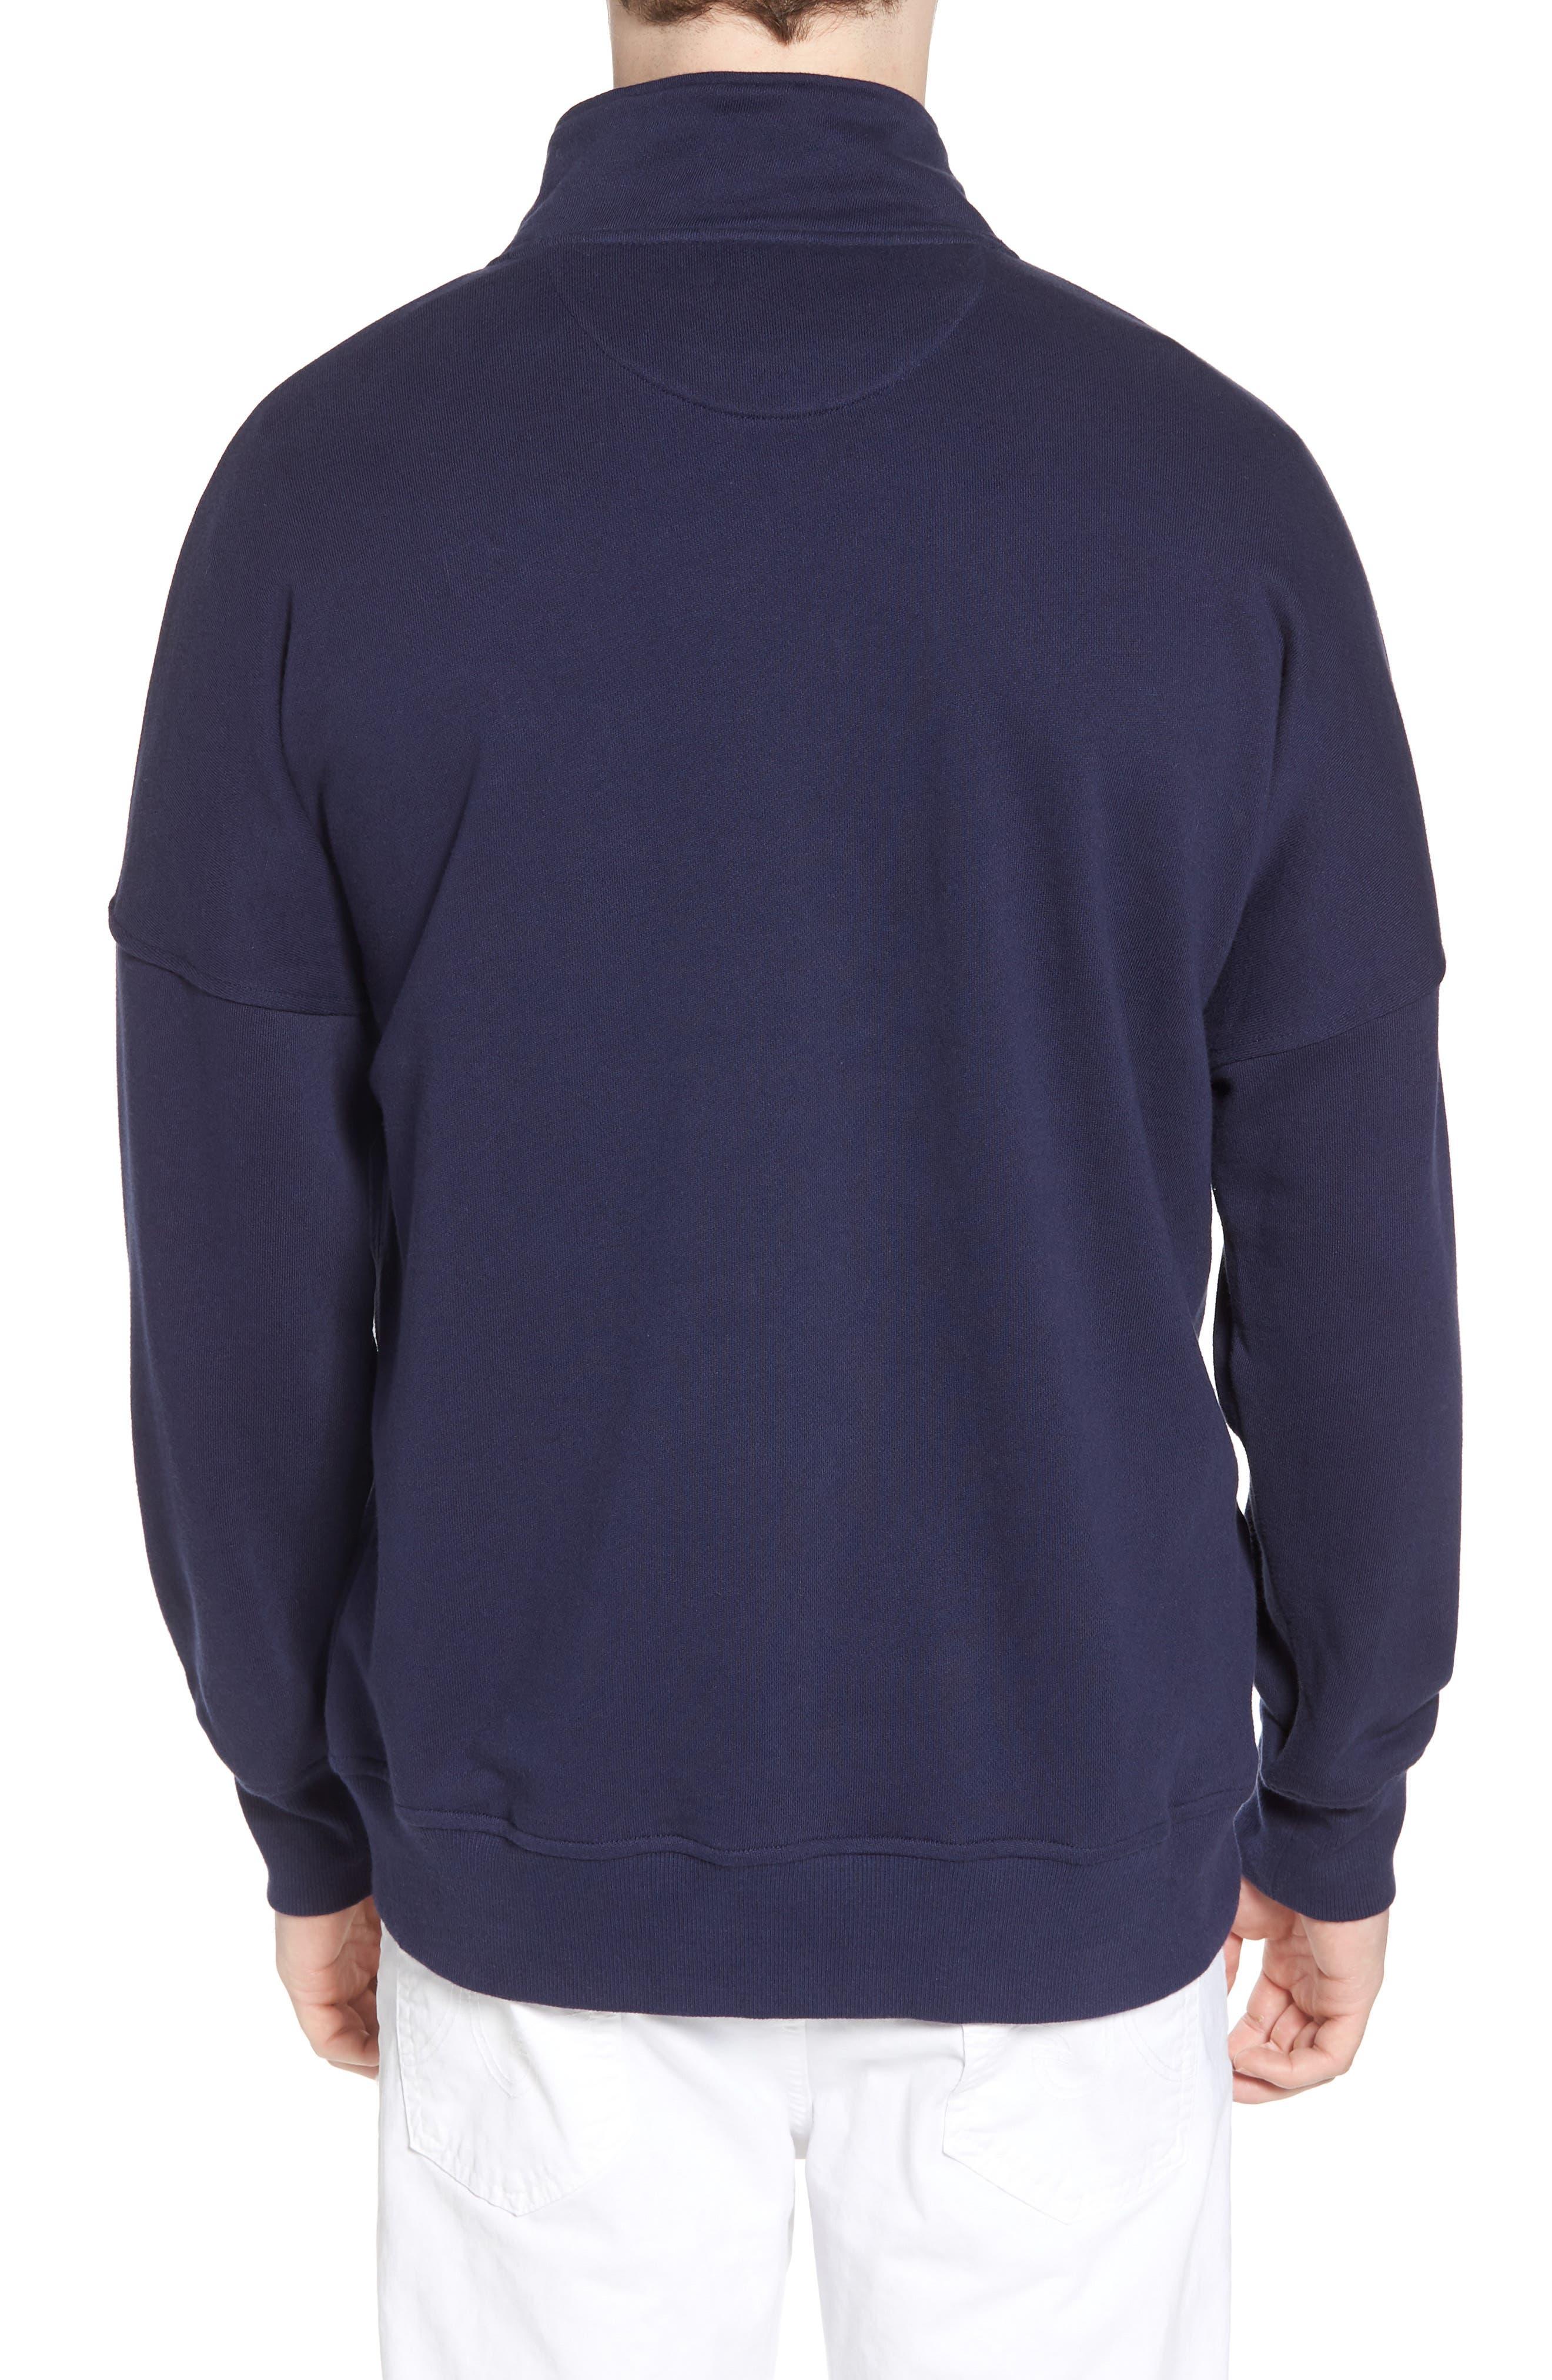 Hosmer Sweatshirt,                             Alternate thumbnail 2, color,                             400